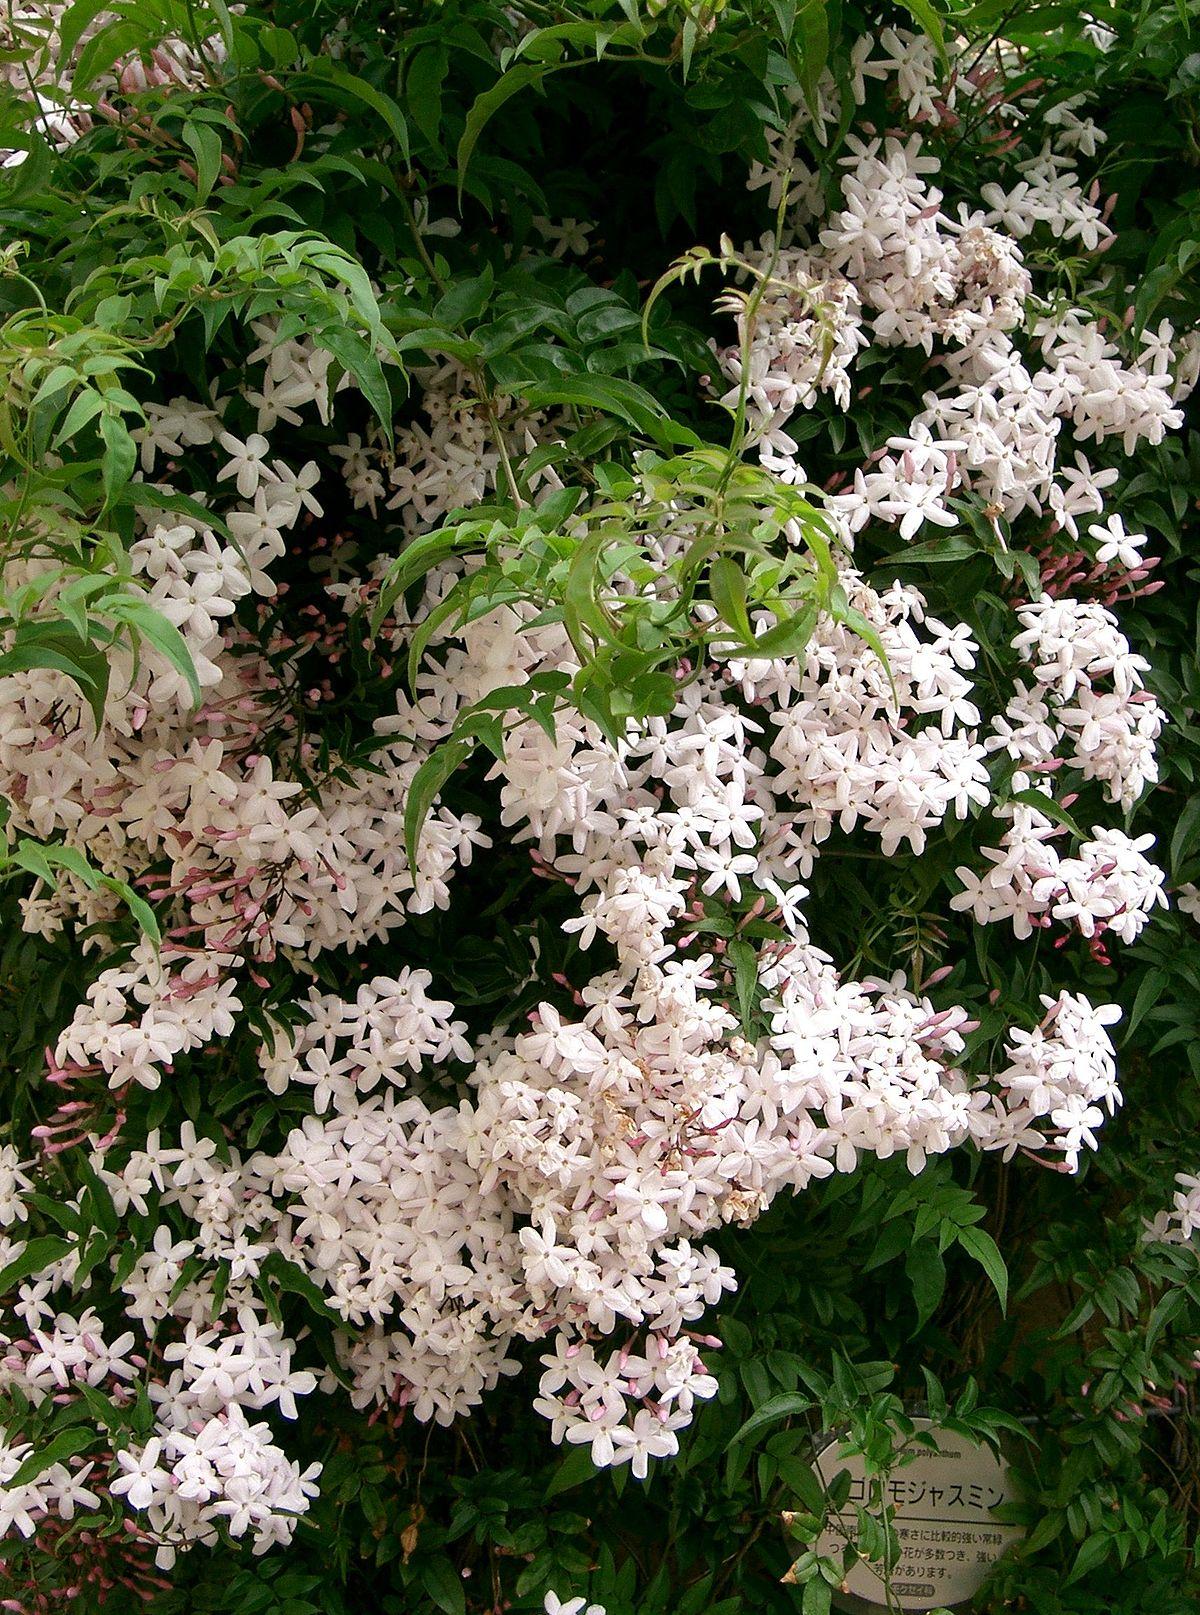 Jasminum polyanthum wikip dia - Jasmin blanc d hiver ...